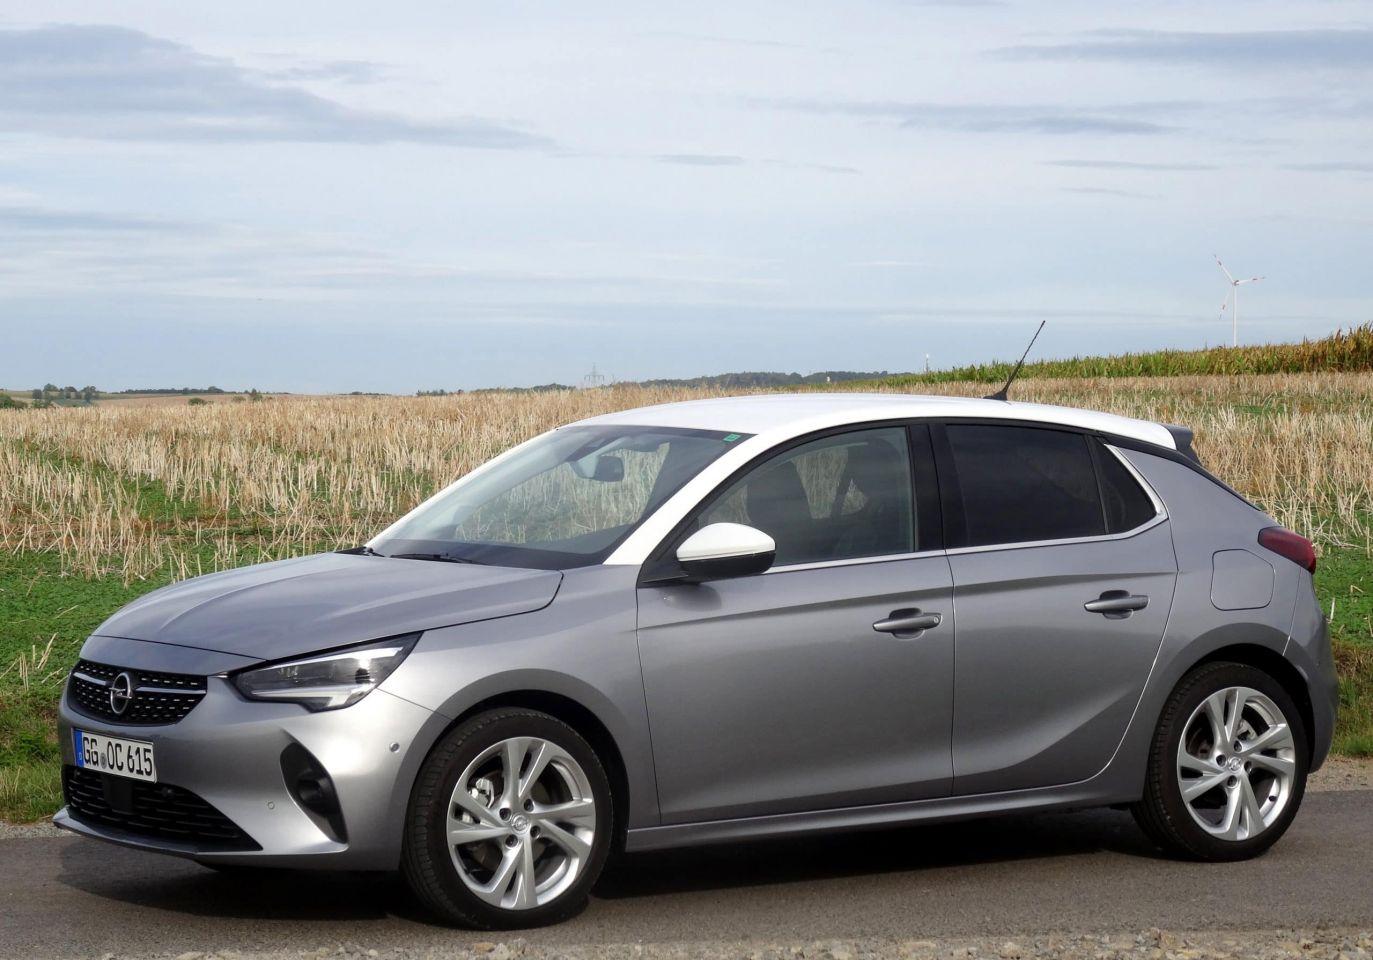 Opel Corsa 1.2 Direct Turbo Injection: Flotter Dreizylinder in kleinem Fünftürer